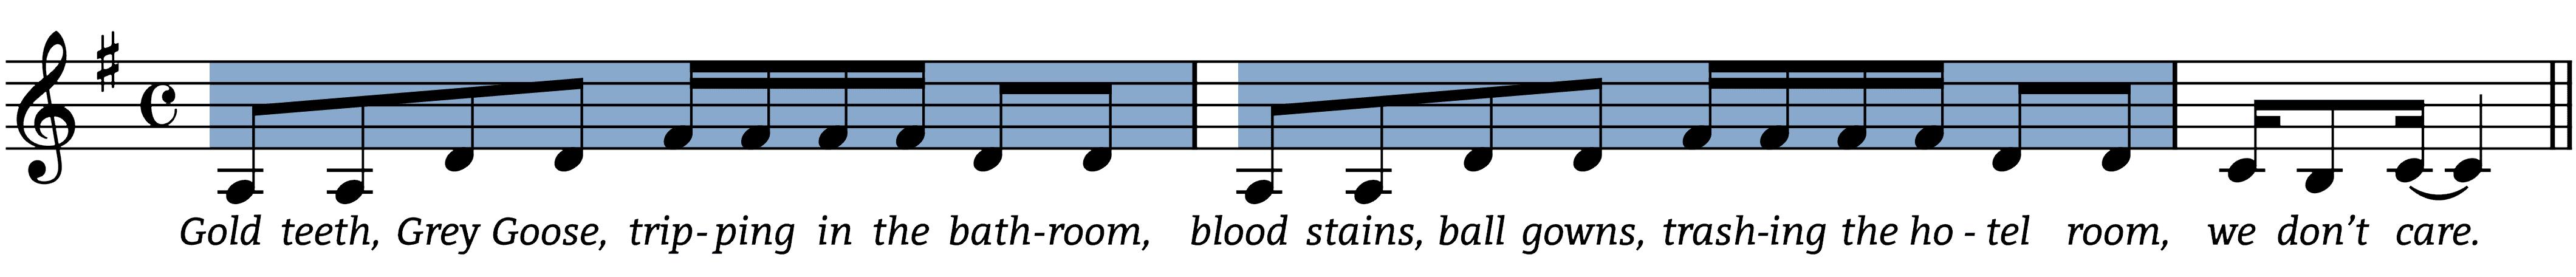 royals arpeggio figures in melody